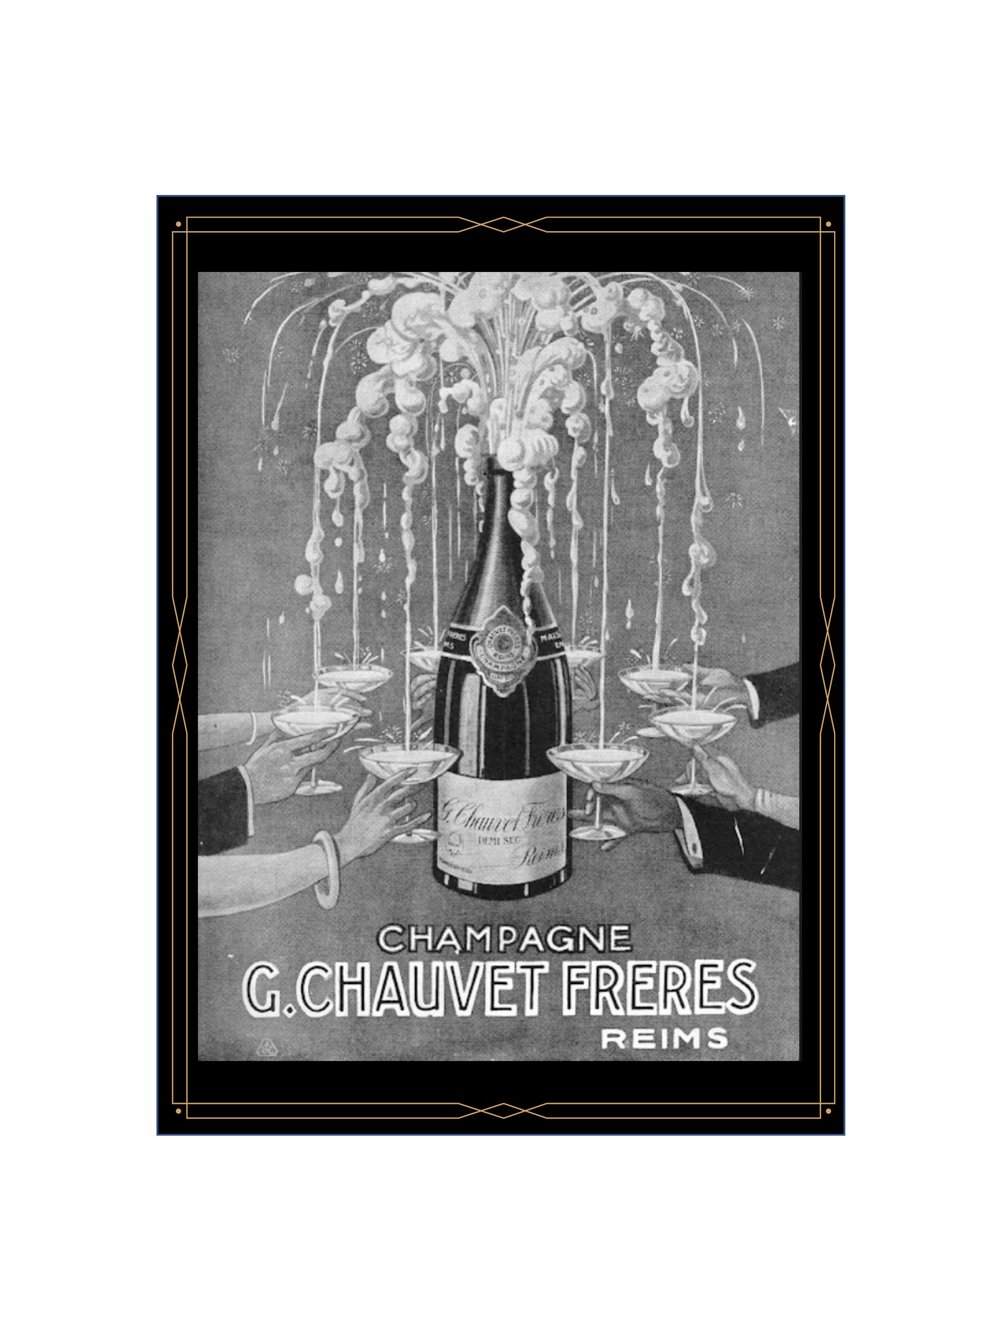 Champagne Poster.jpg